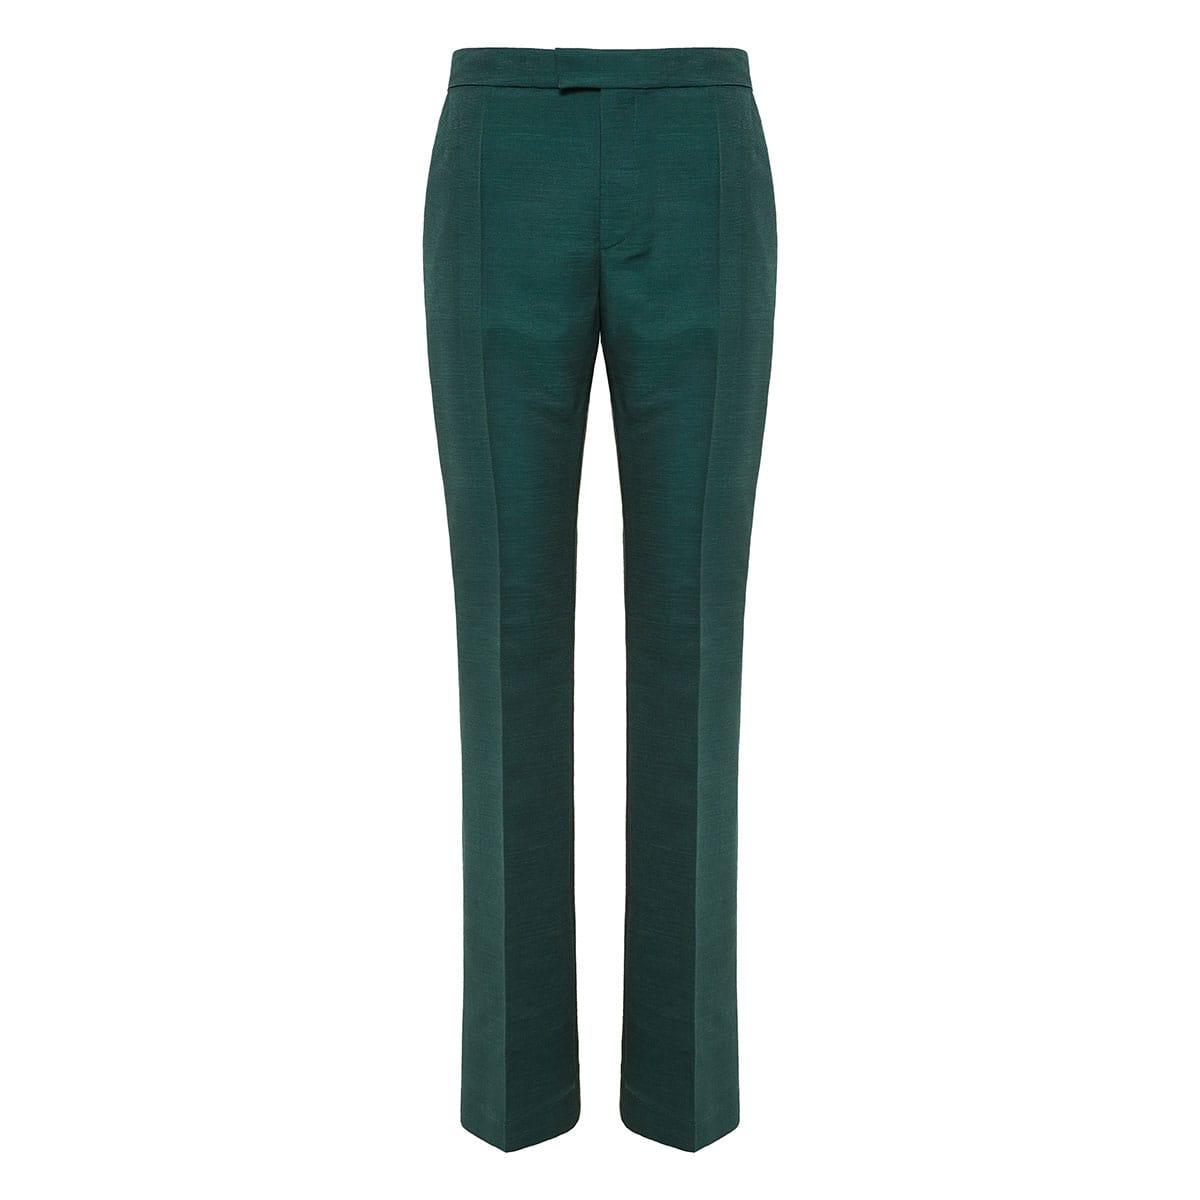 Saturday Night tailored trousers